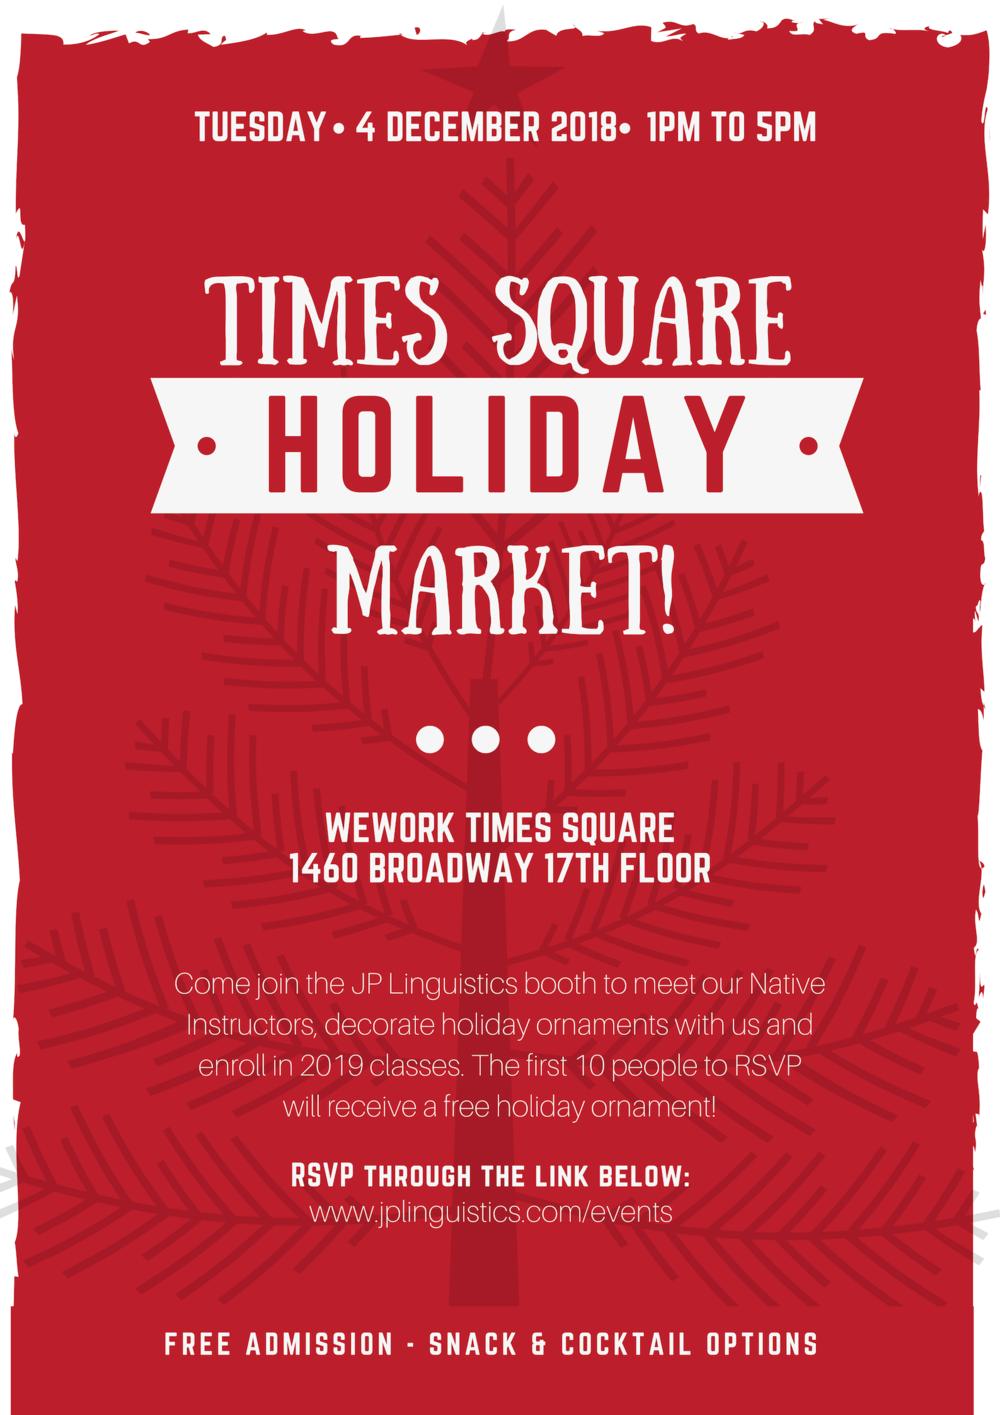 JP Linguistics Times Square Holiday Market WeWork